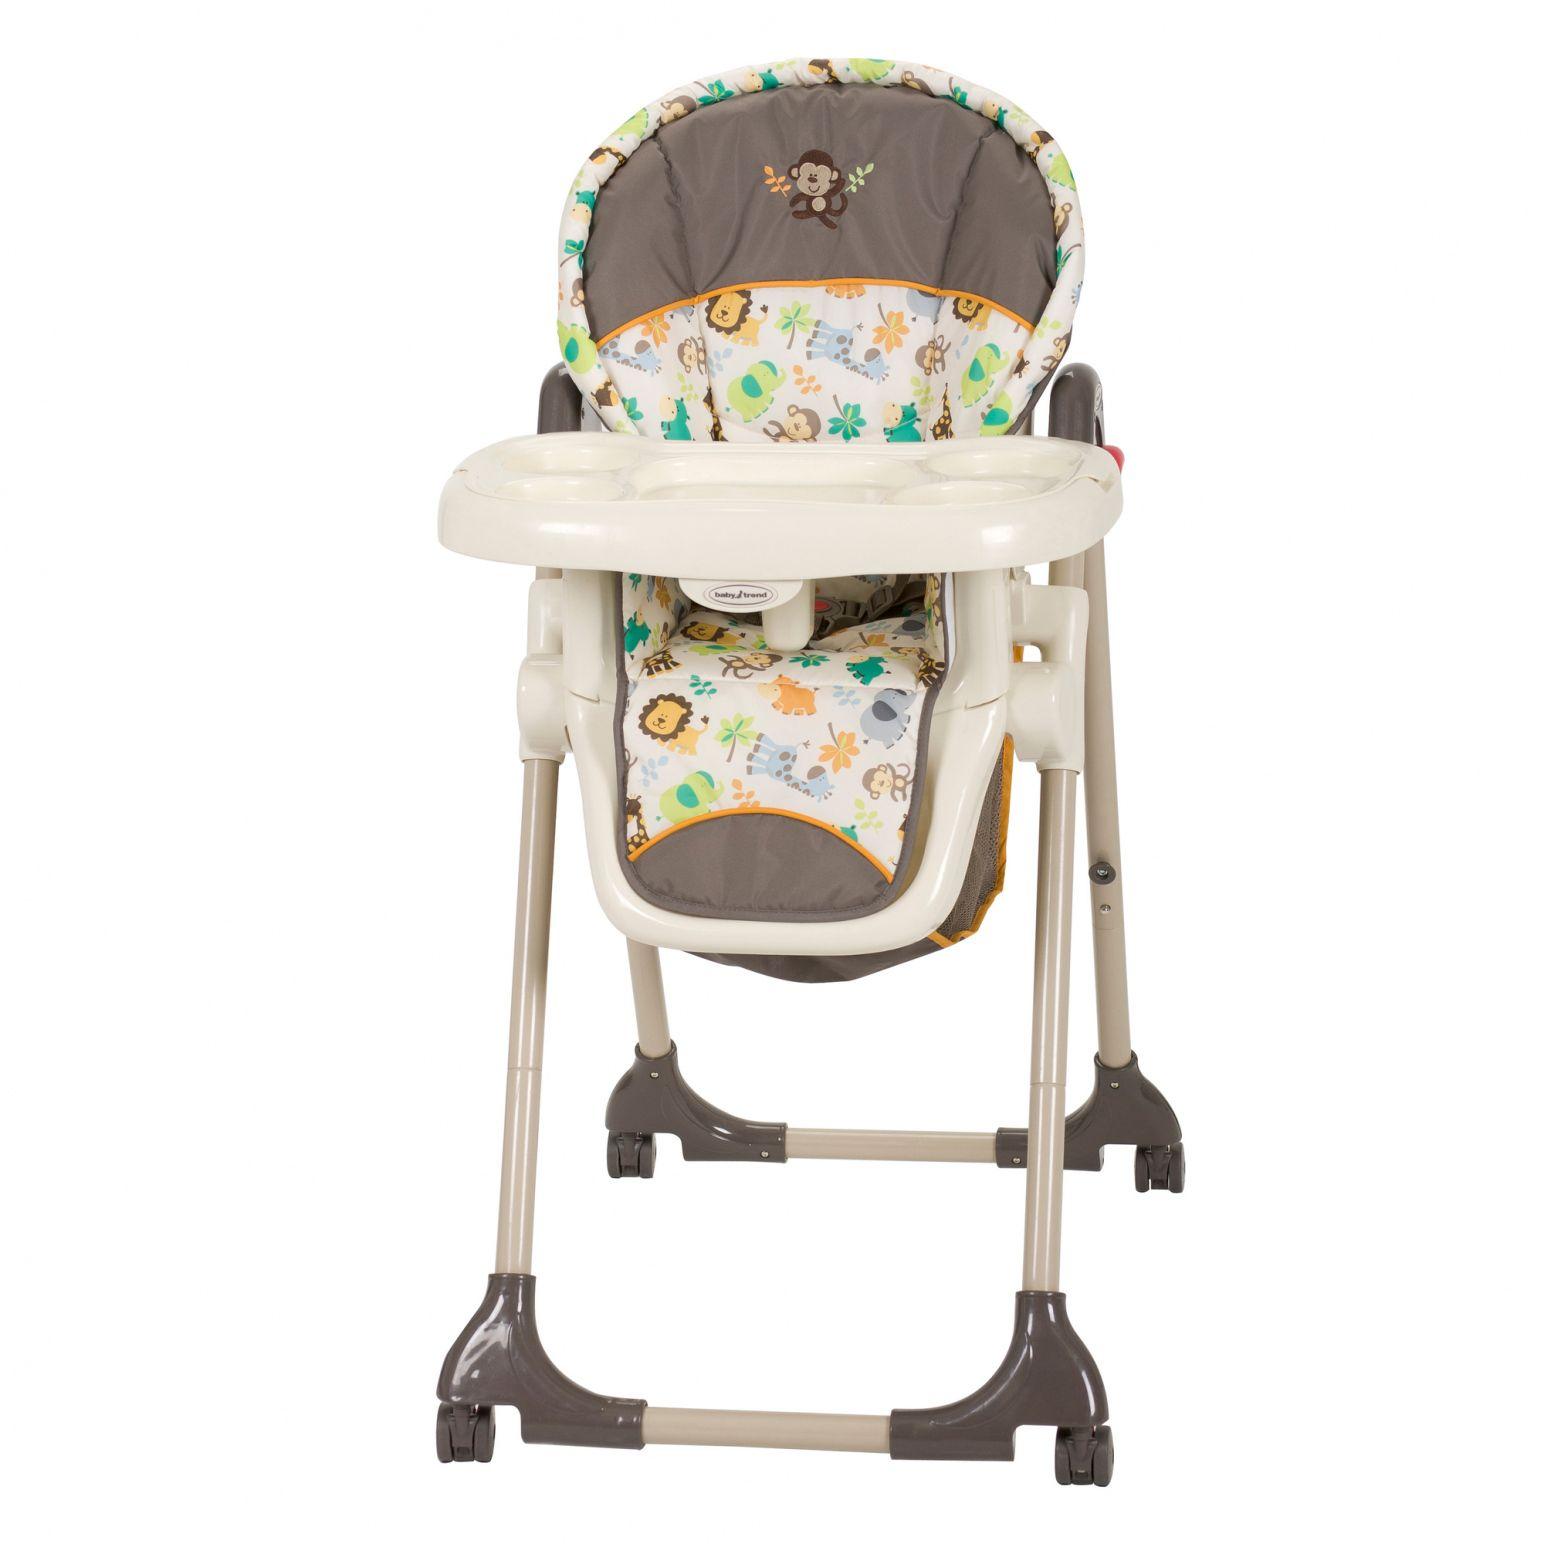 babies r us canada high chair pillow walmart pin oleh jooana di evolusion design concept baby boy dan 100 small kitchen remodel ideas on a budget